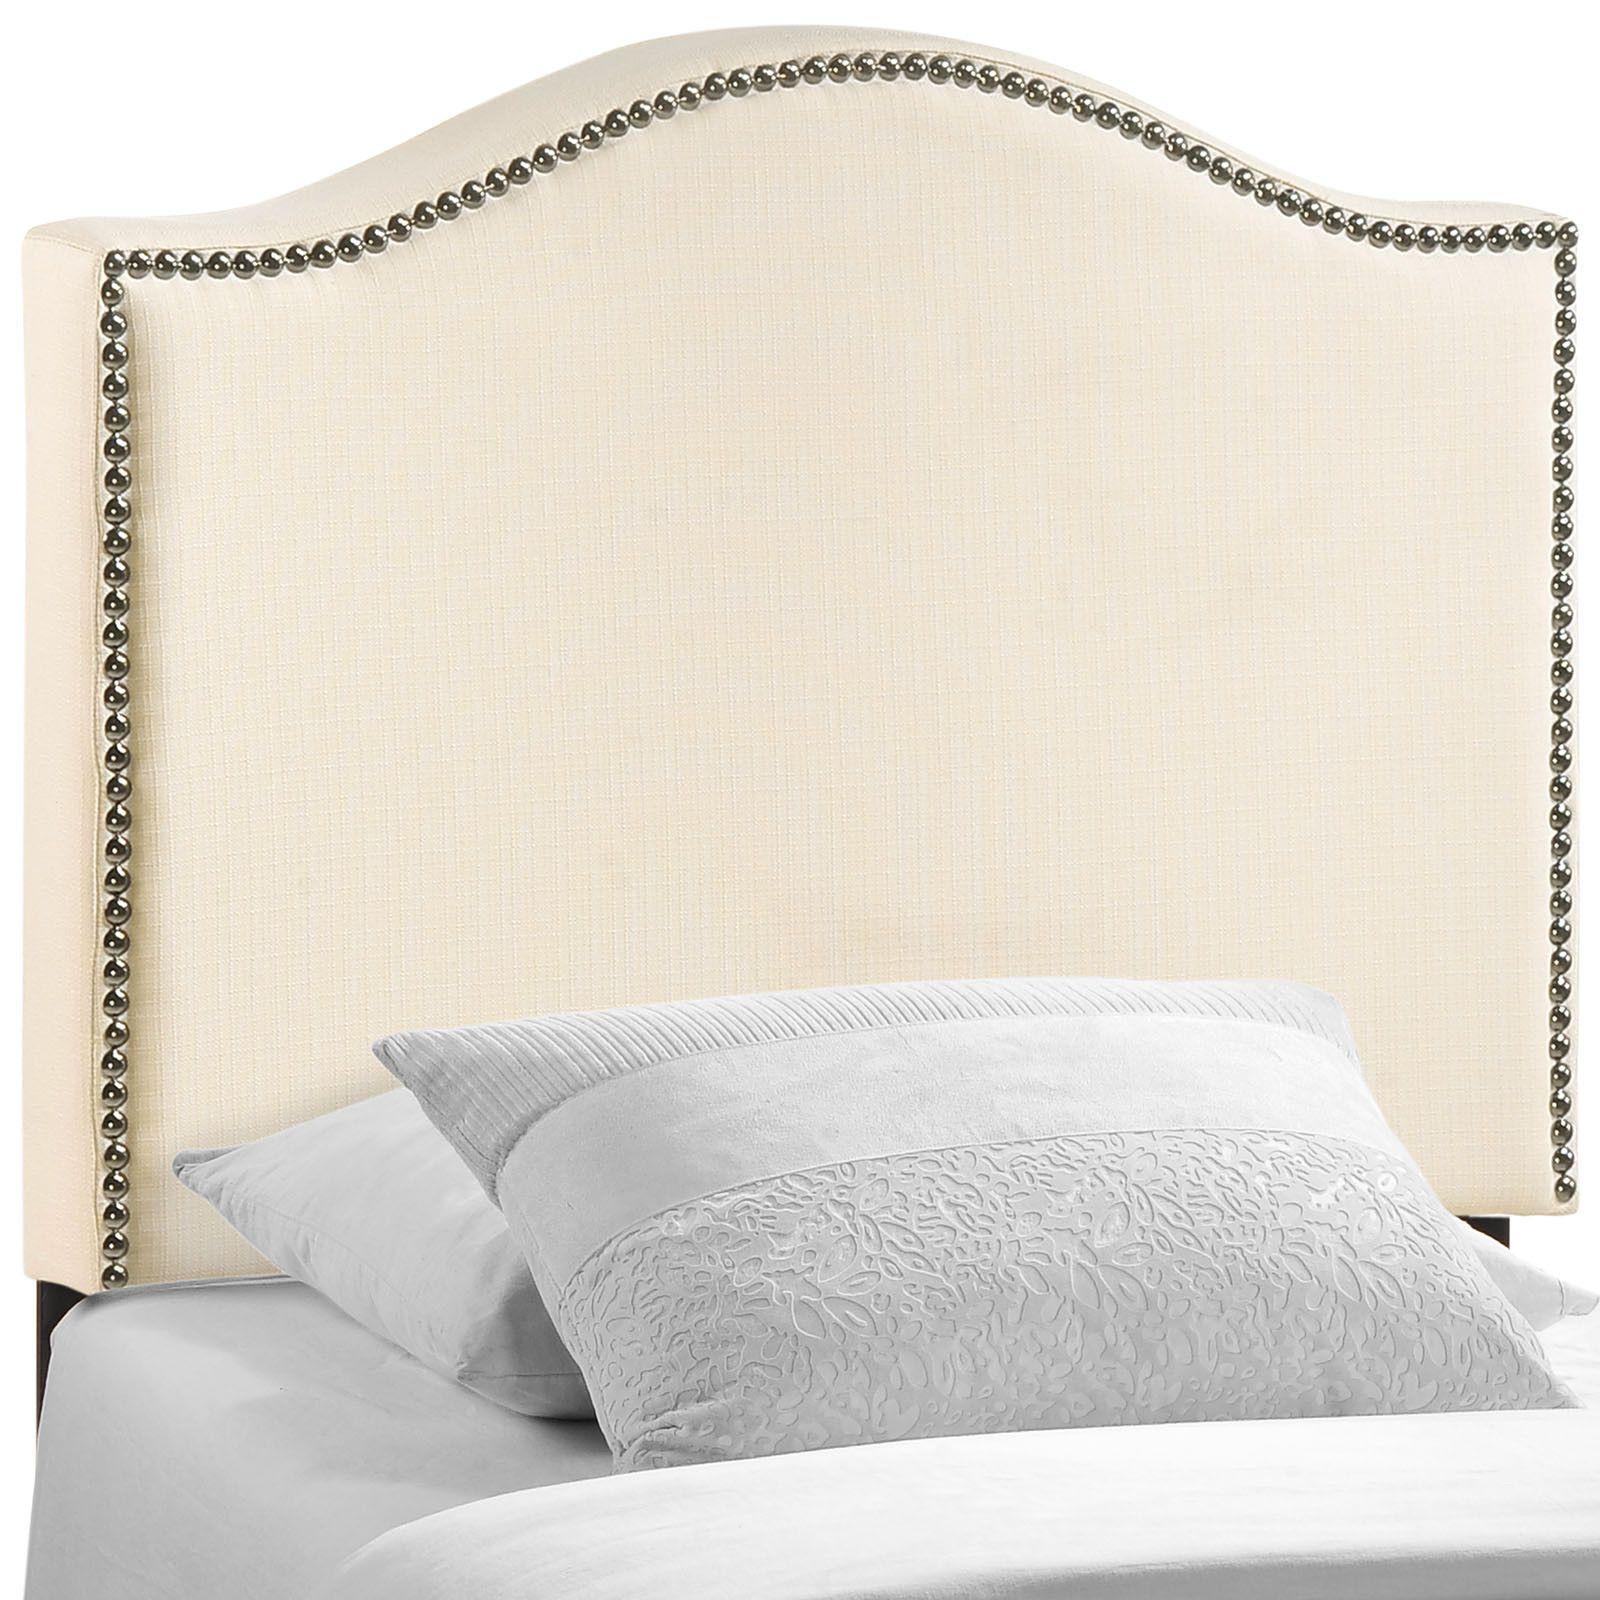 Curl Twin Nailhead Upholstered Headboard | cabeceras | Pinterest